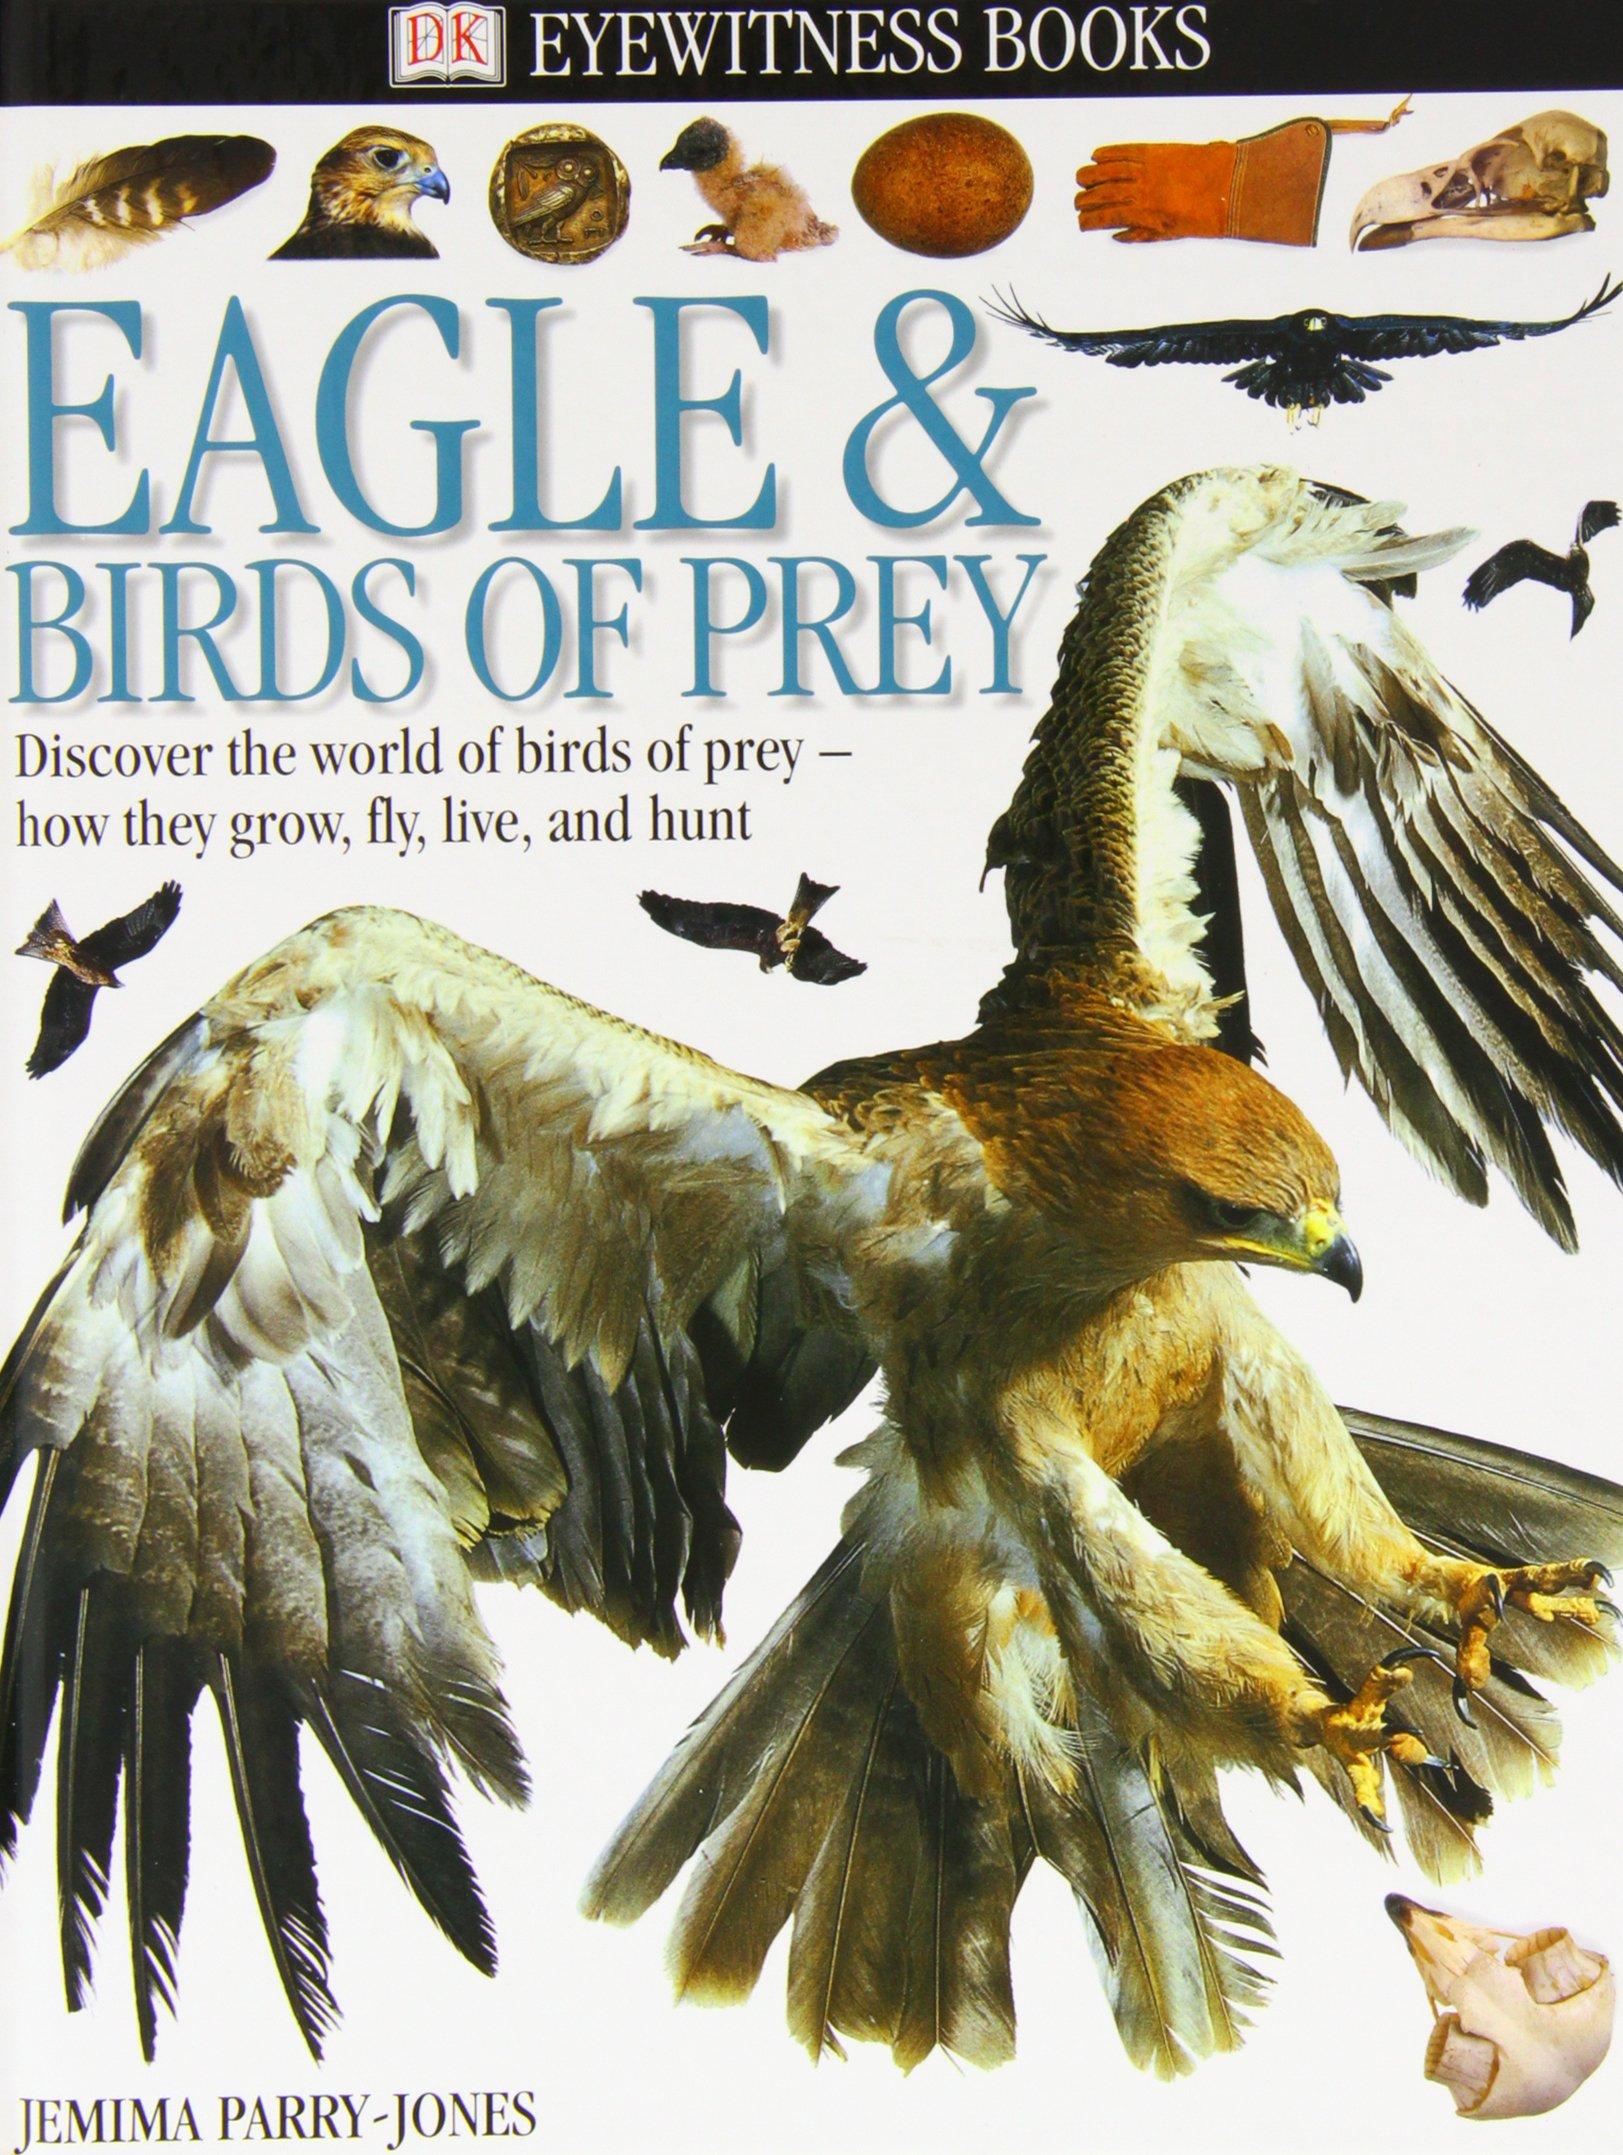 Eagles and Birds of Prey (DK Eyewitness Books): Amazon.co.uk: Jemima Parry- Jones MBE: Books